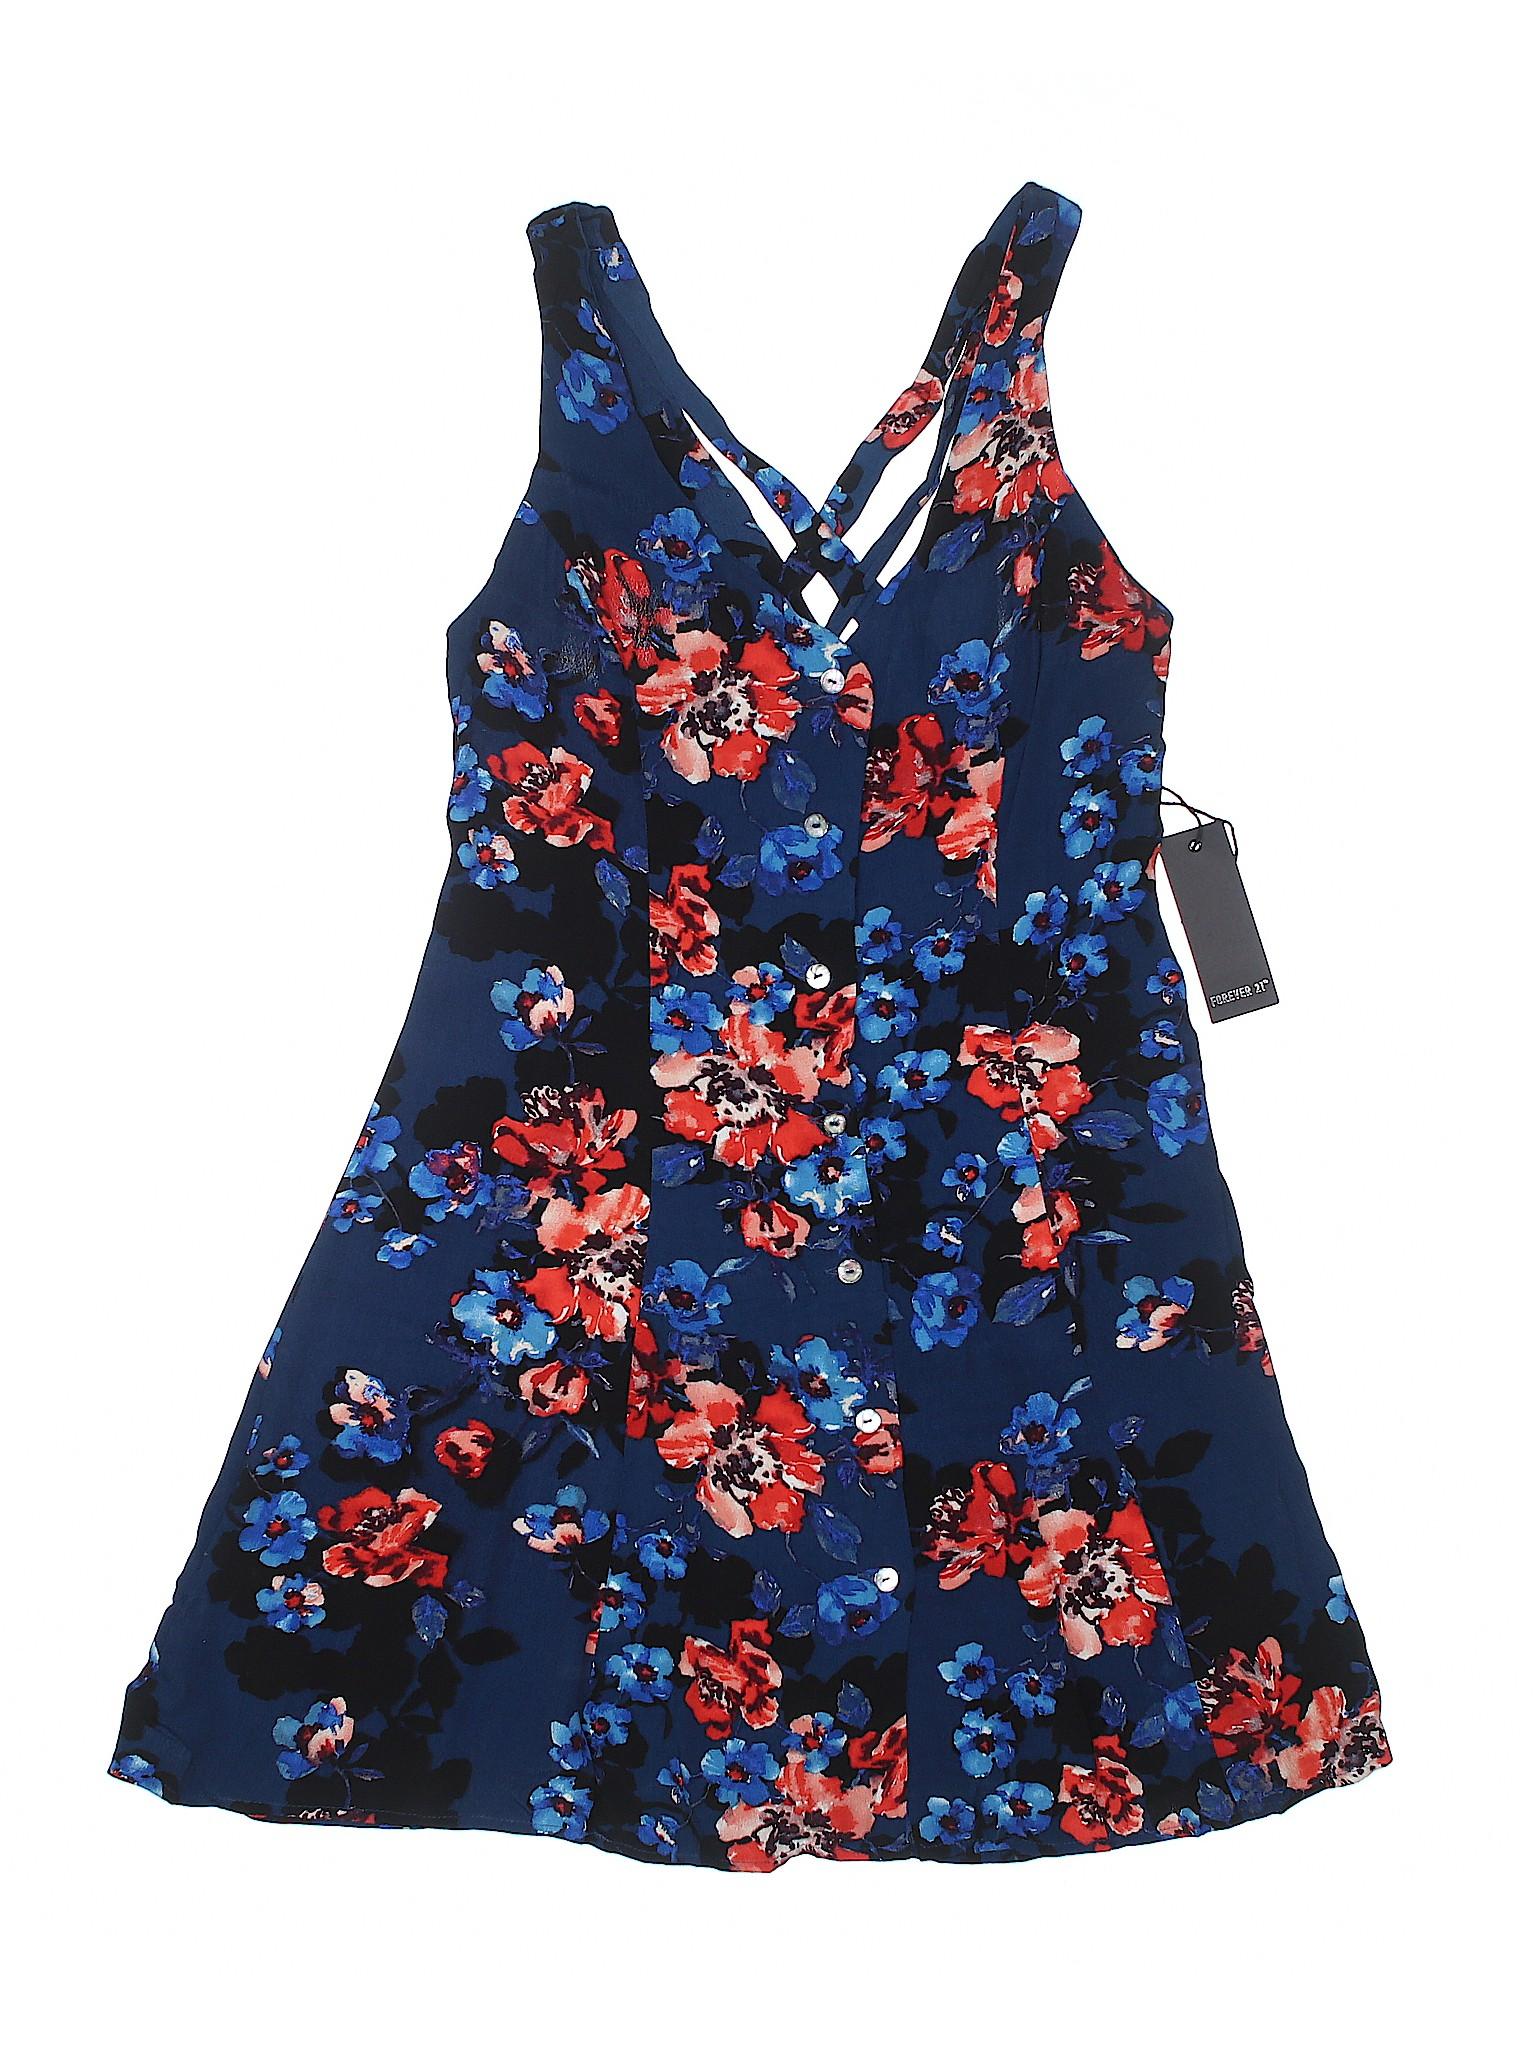 Dress Forever 21 Forever Dress Casual Casual 21 Casual Forever 21 Selling Selling Selling 0pFwdq1p